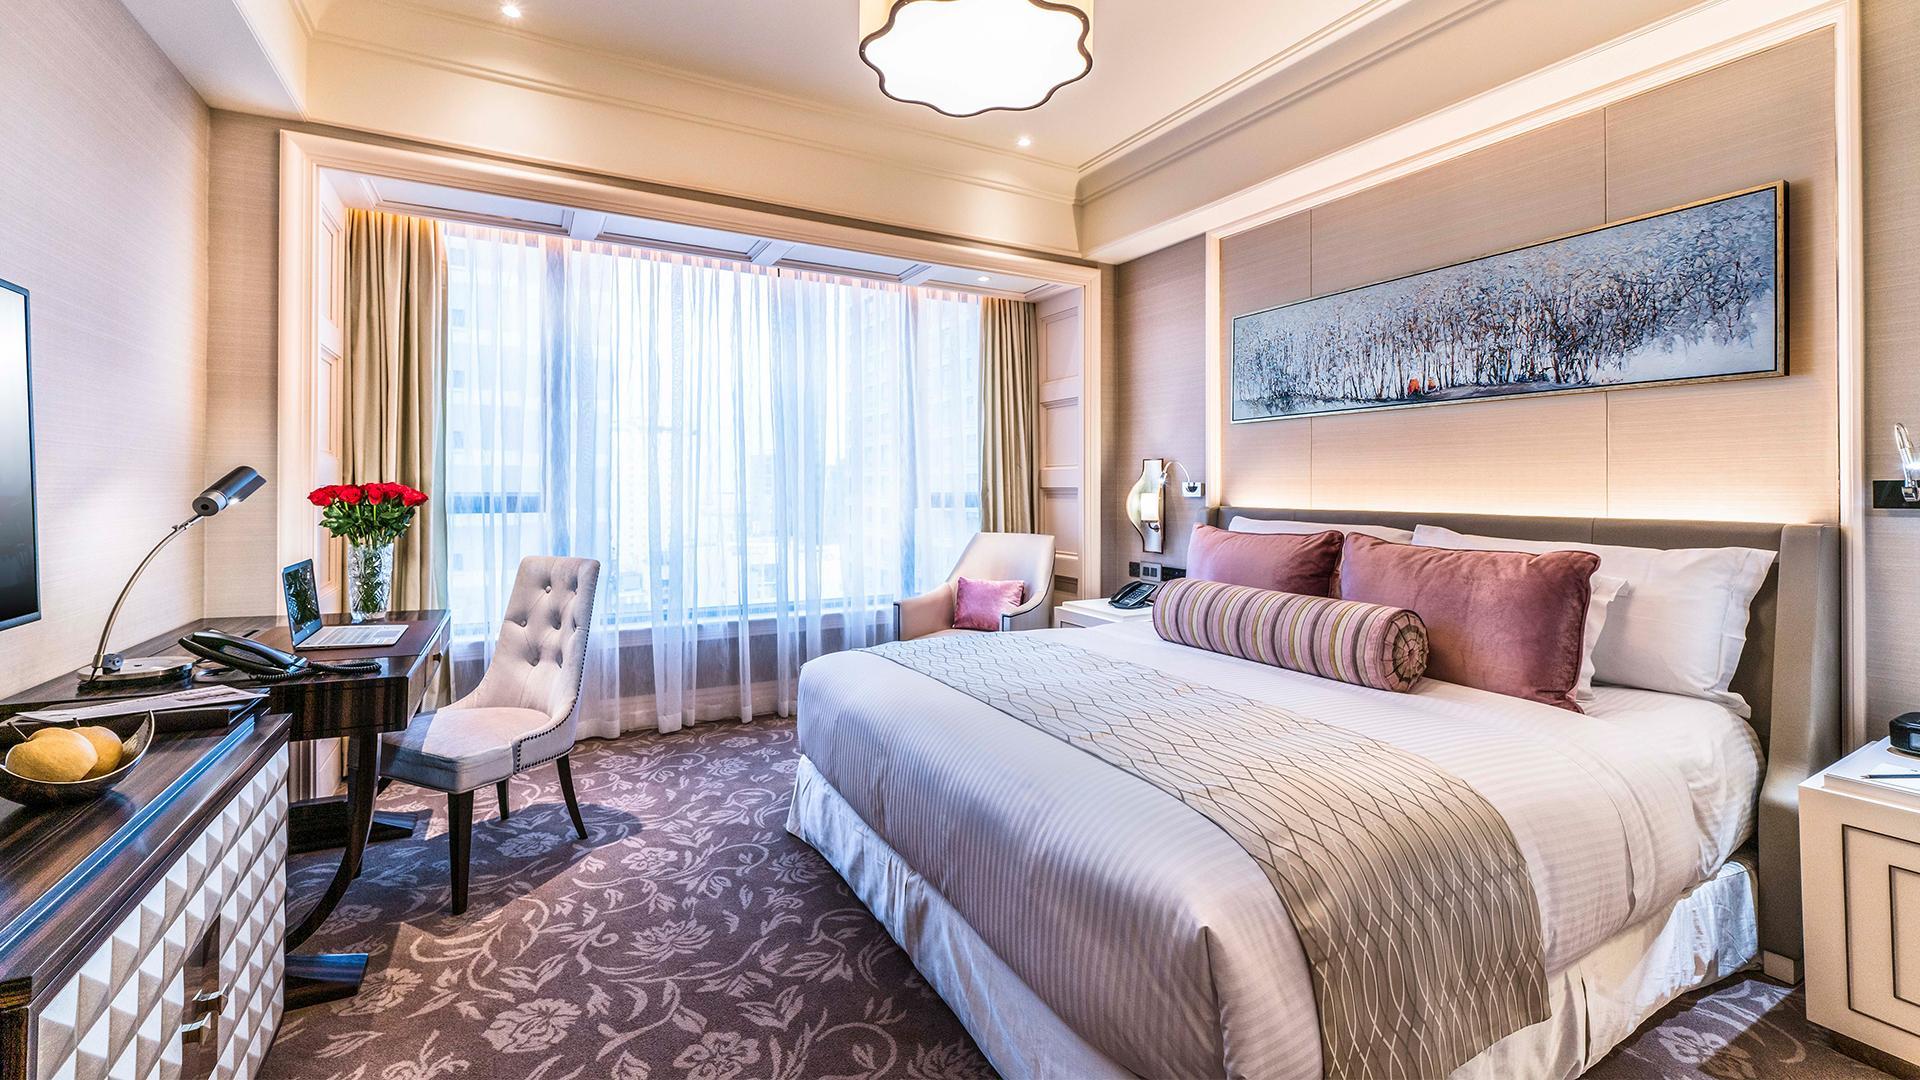 Deluxe Room image 1 at Caravelle Saigon Feb 2020 by Quận 1, Hồ Chí Minh, Vietnam